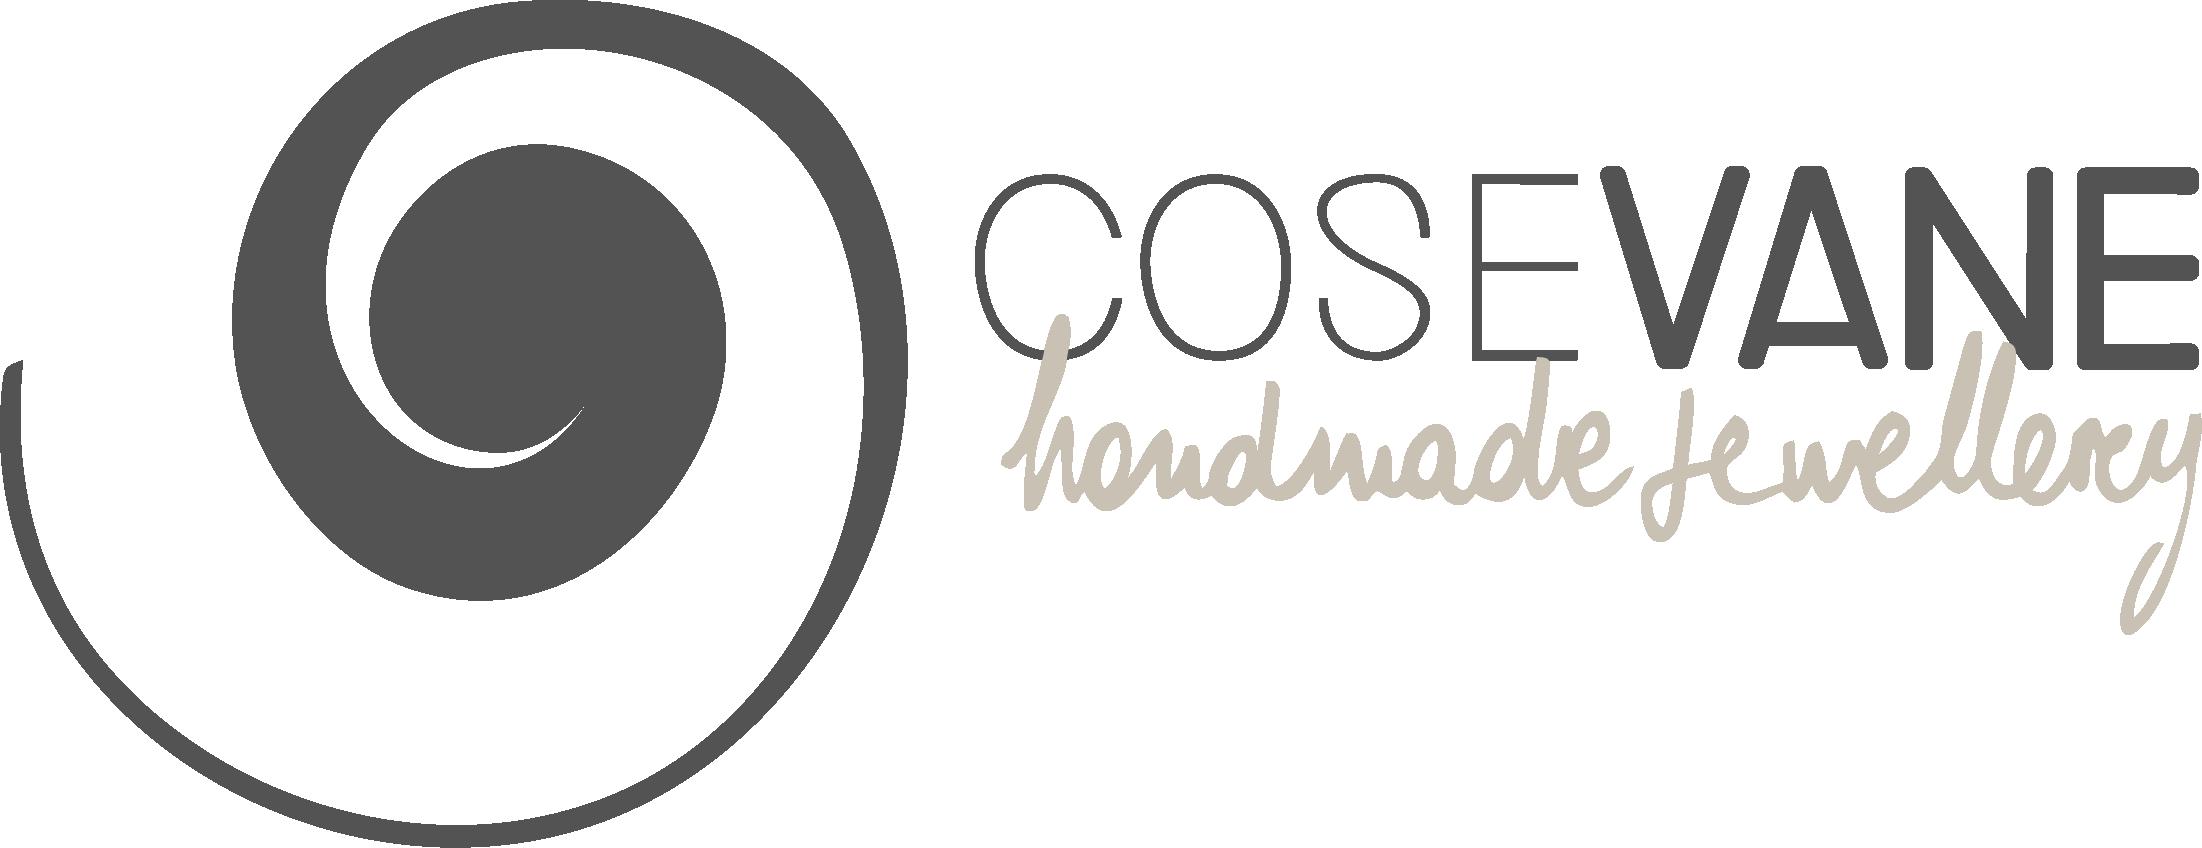 Cosevane Shop